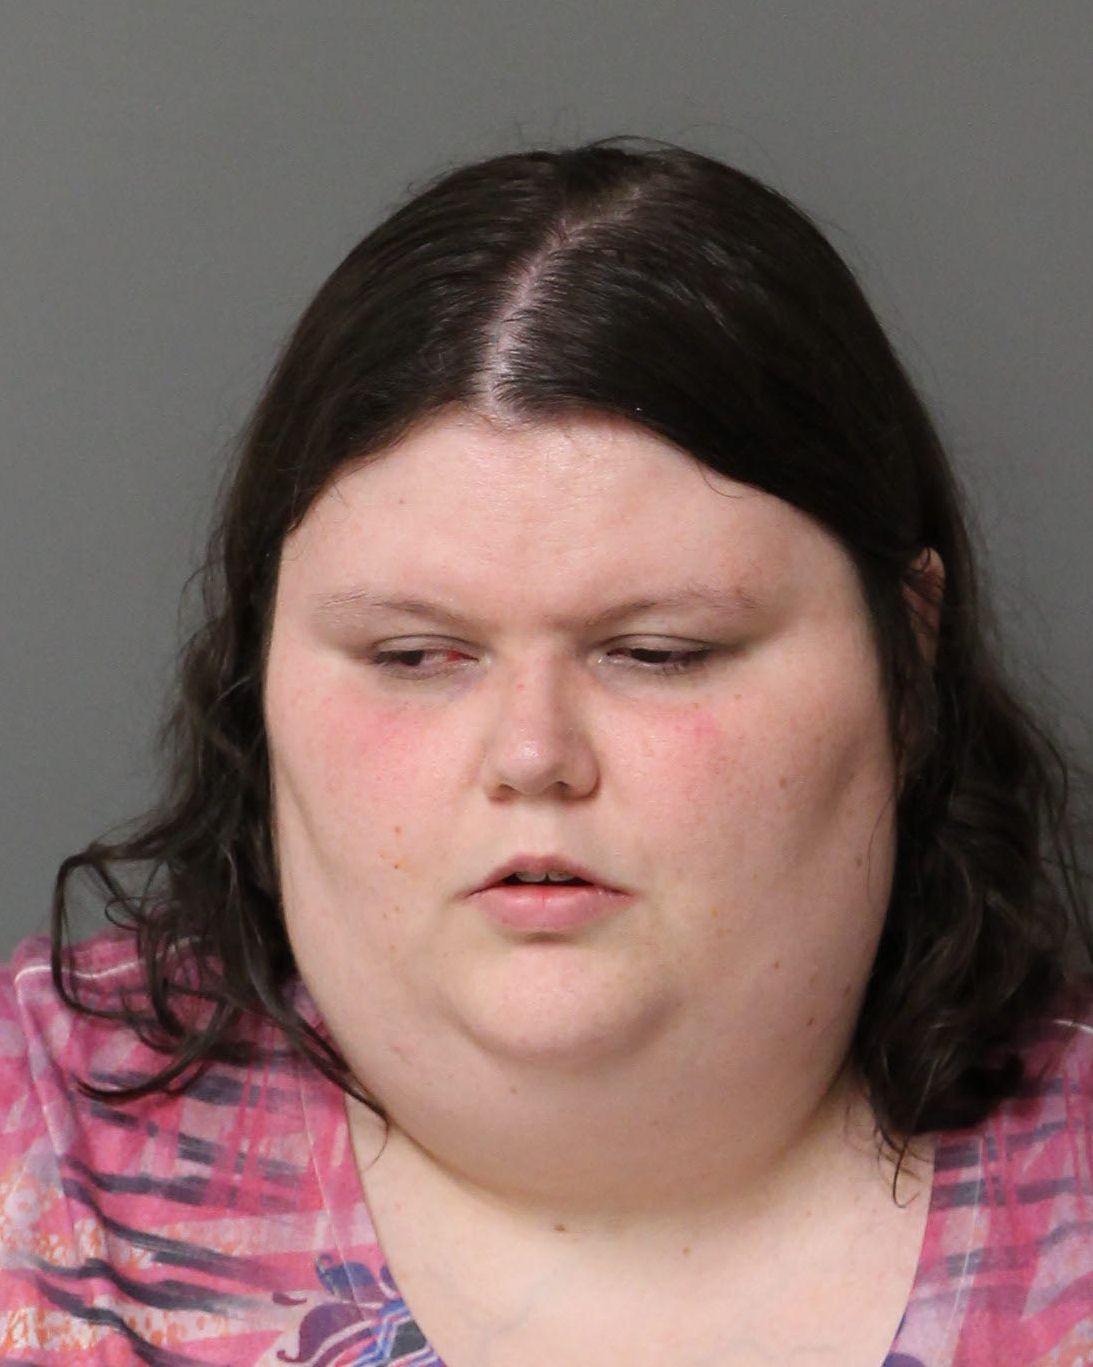 SAMANTHA KAY WILDS Mugshot / County Arrests / Wake County Arrests